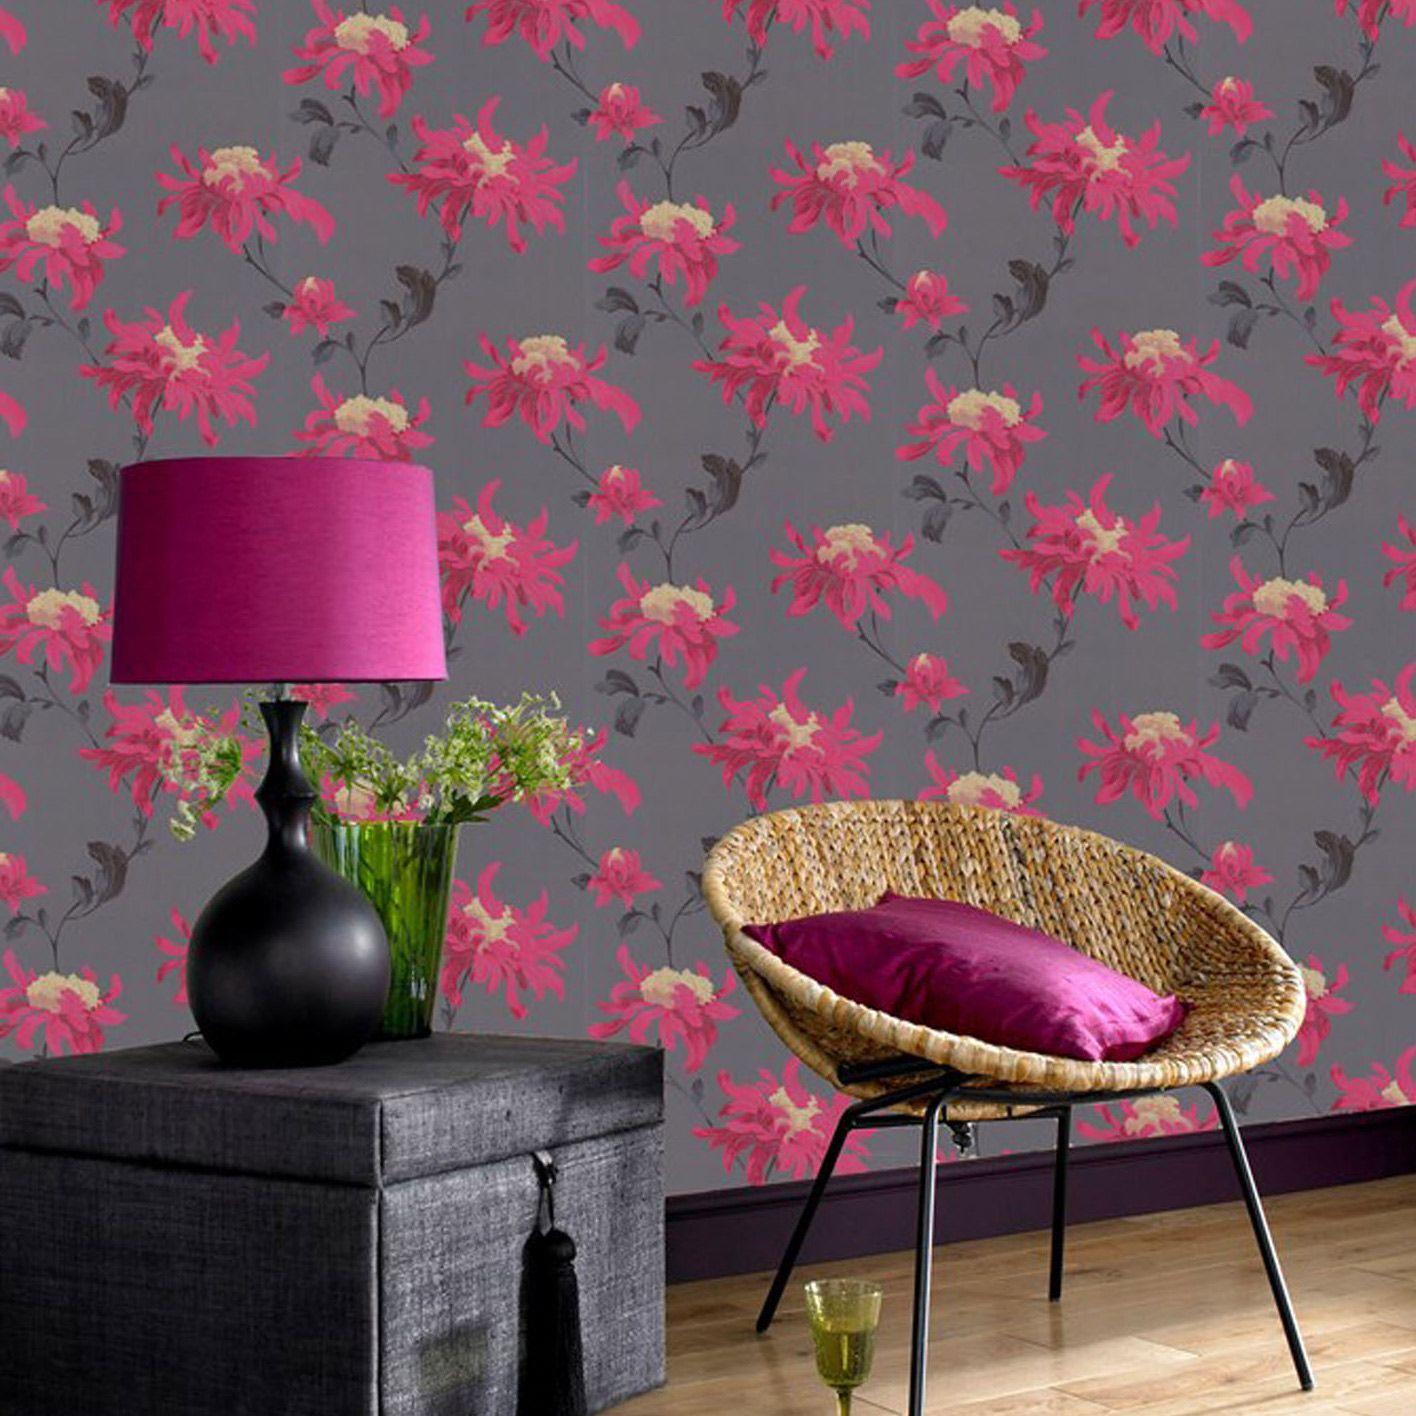 Graham Brown Julien MacDonald Fabulous Pink Wallpaper